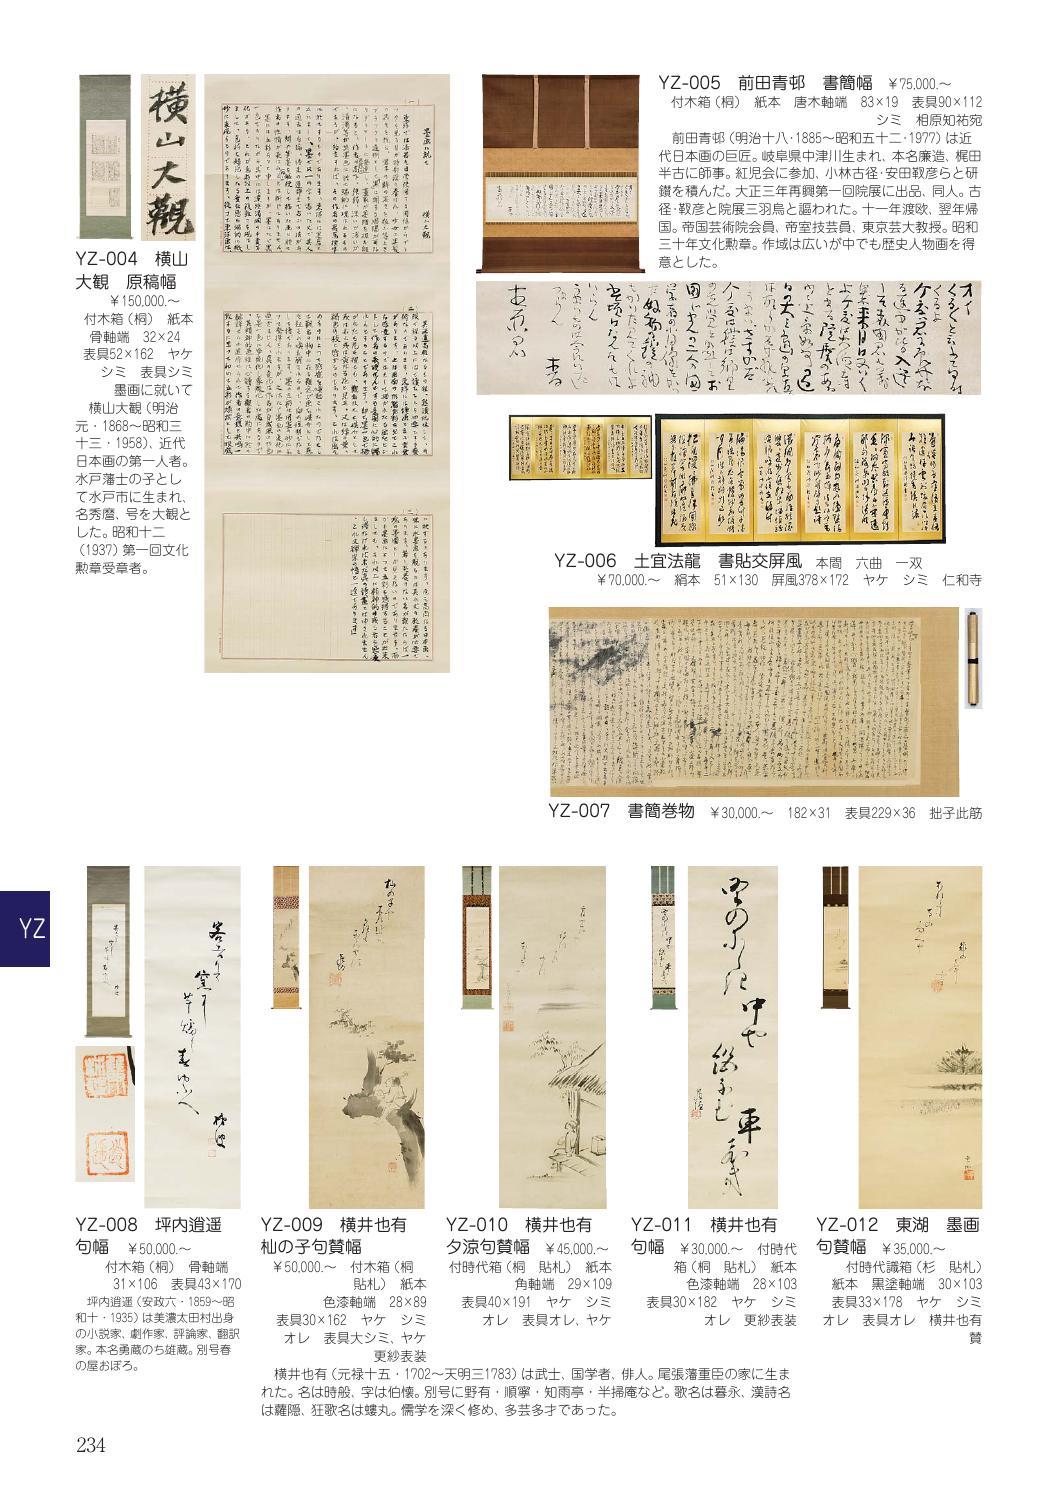 97th KOGIRE-KAI Silent Auction Catalog 2 97th KOGIRE-KAI Silent Auction Catalog 2